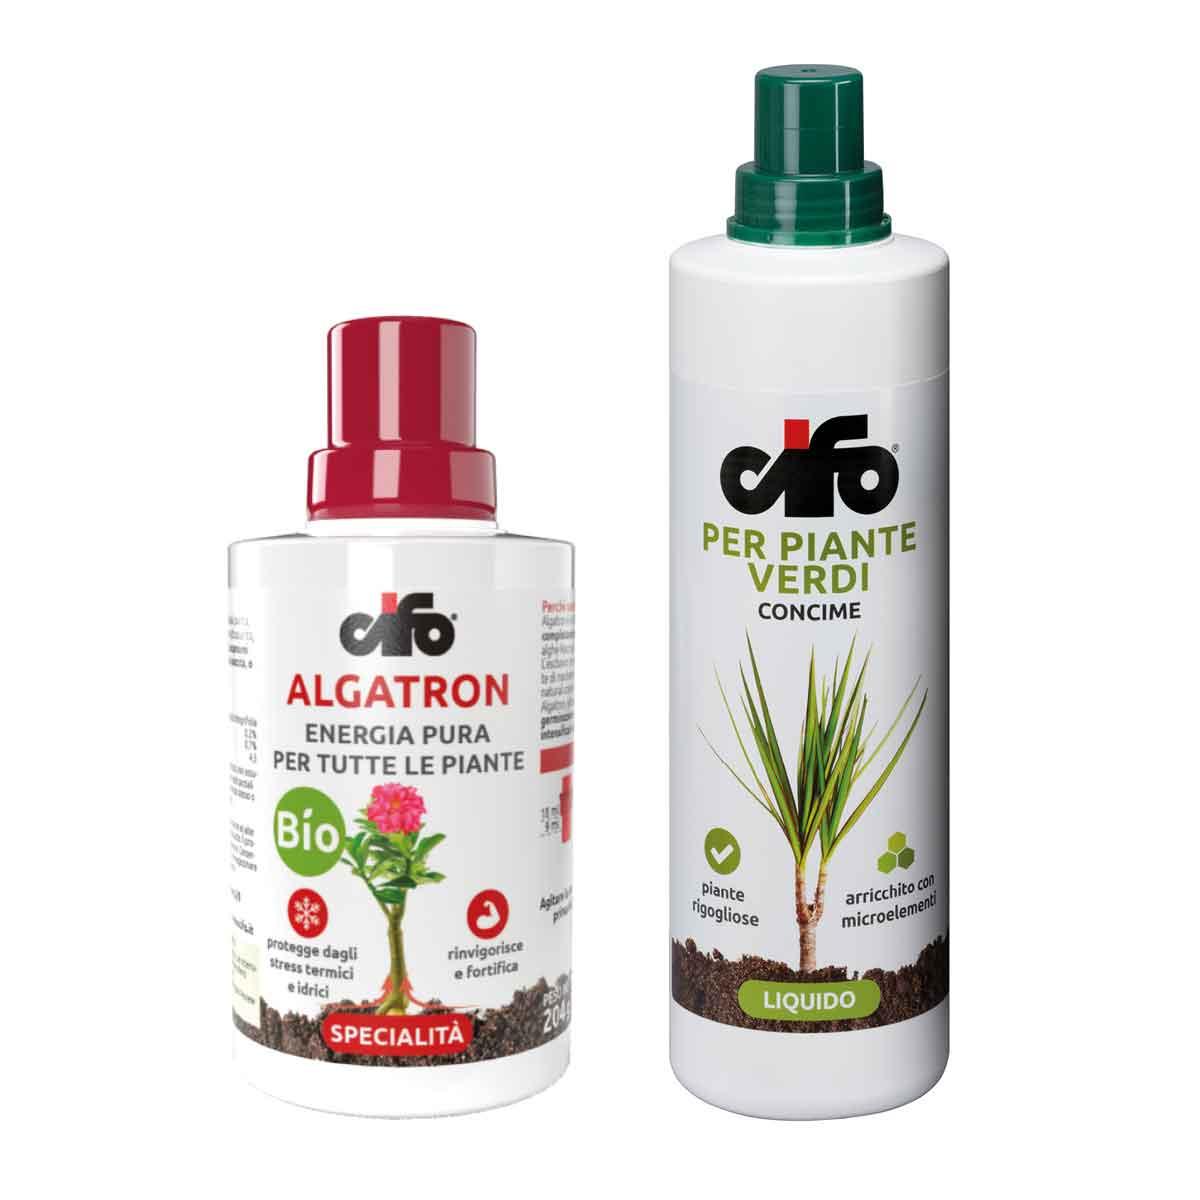 Cifo Concime Piante Verdi + Algatron